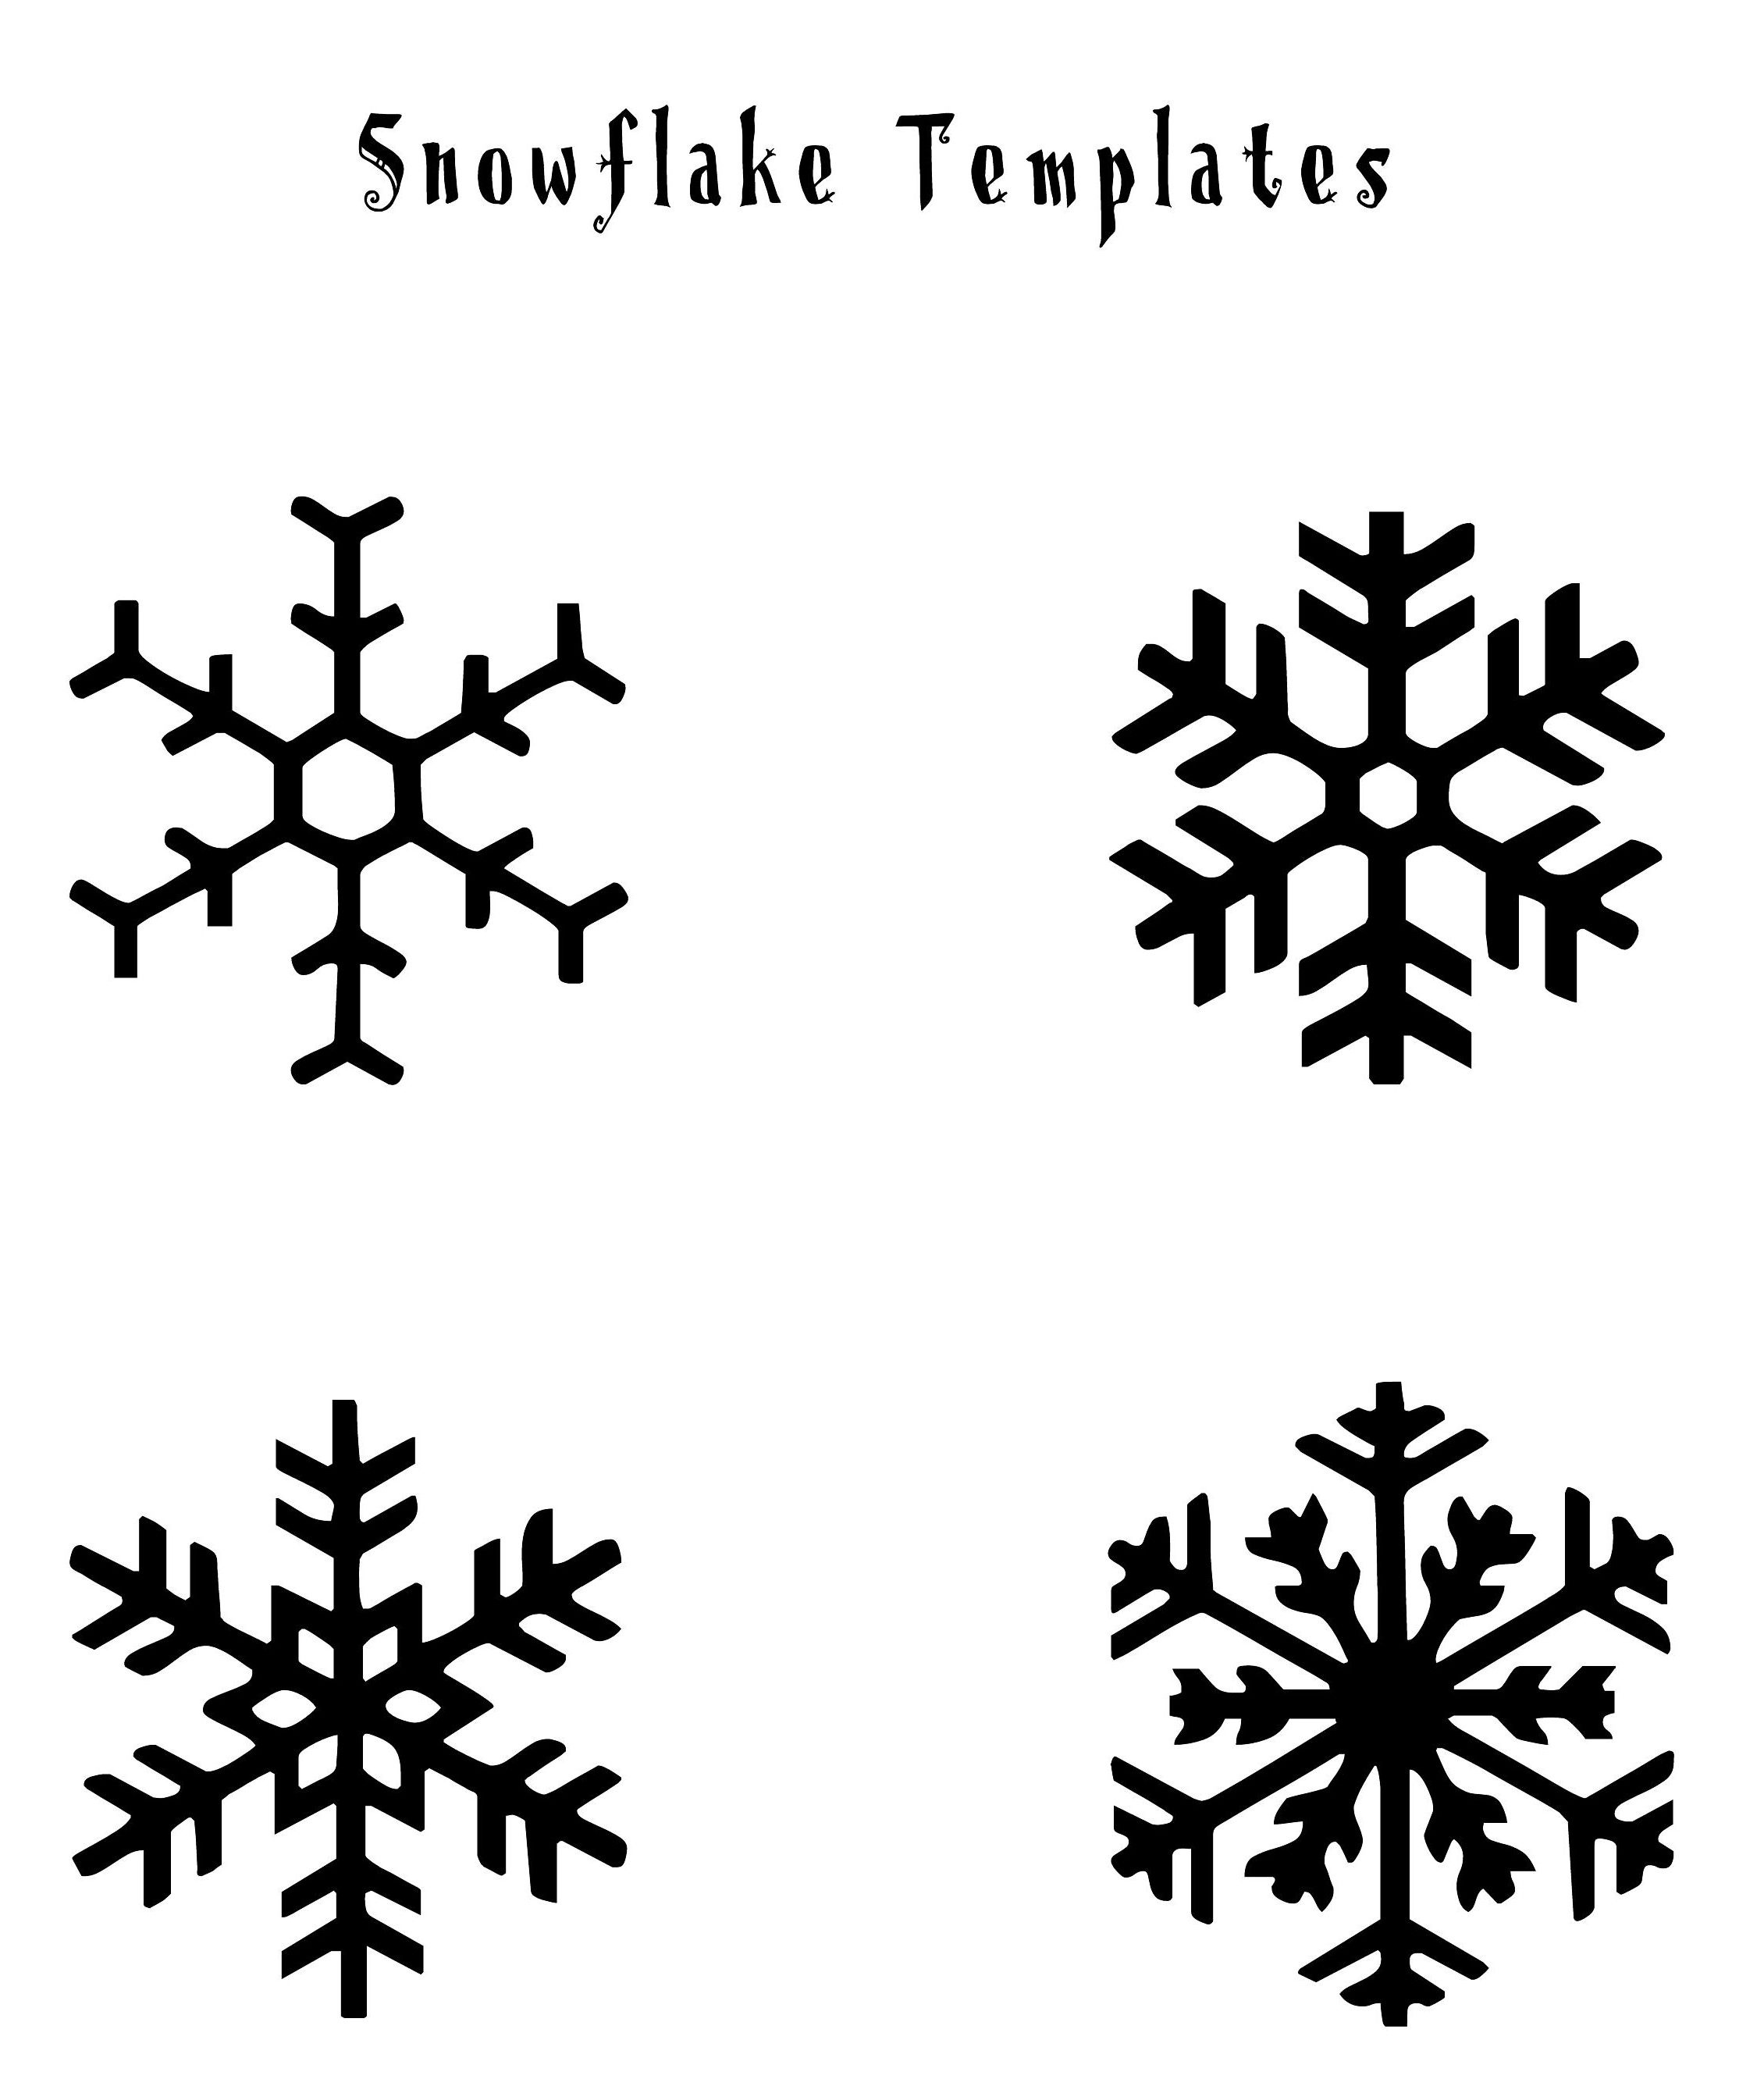 Image Result For Snowflake | Christmas Fun | Snowflake Template - Free Printable Snowflake Patterns